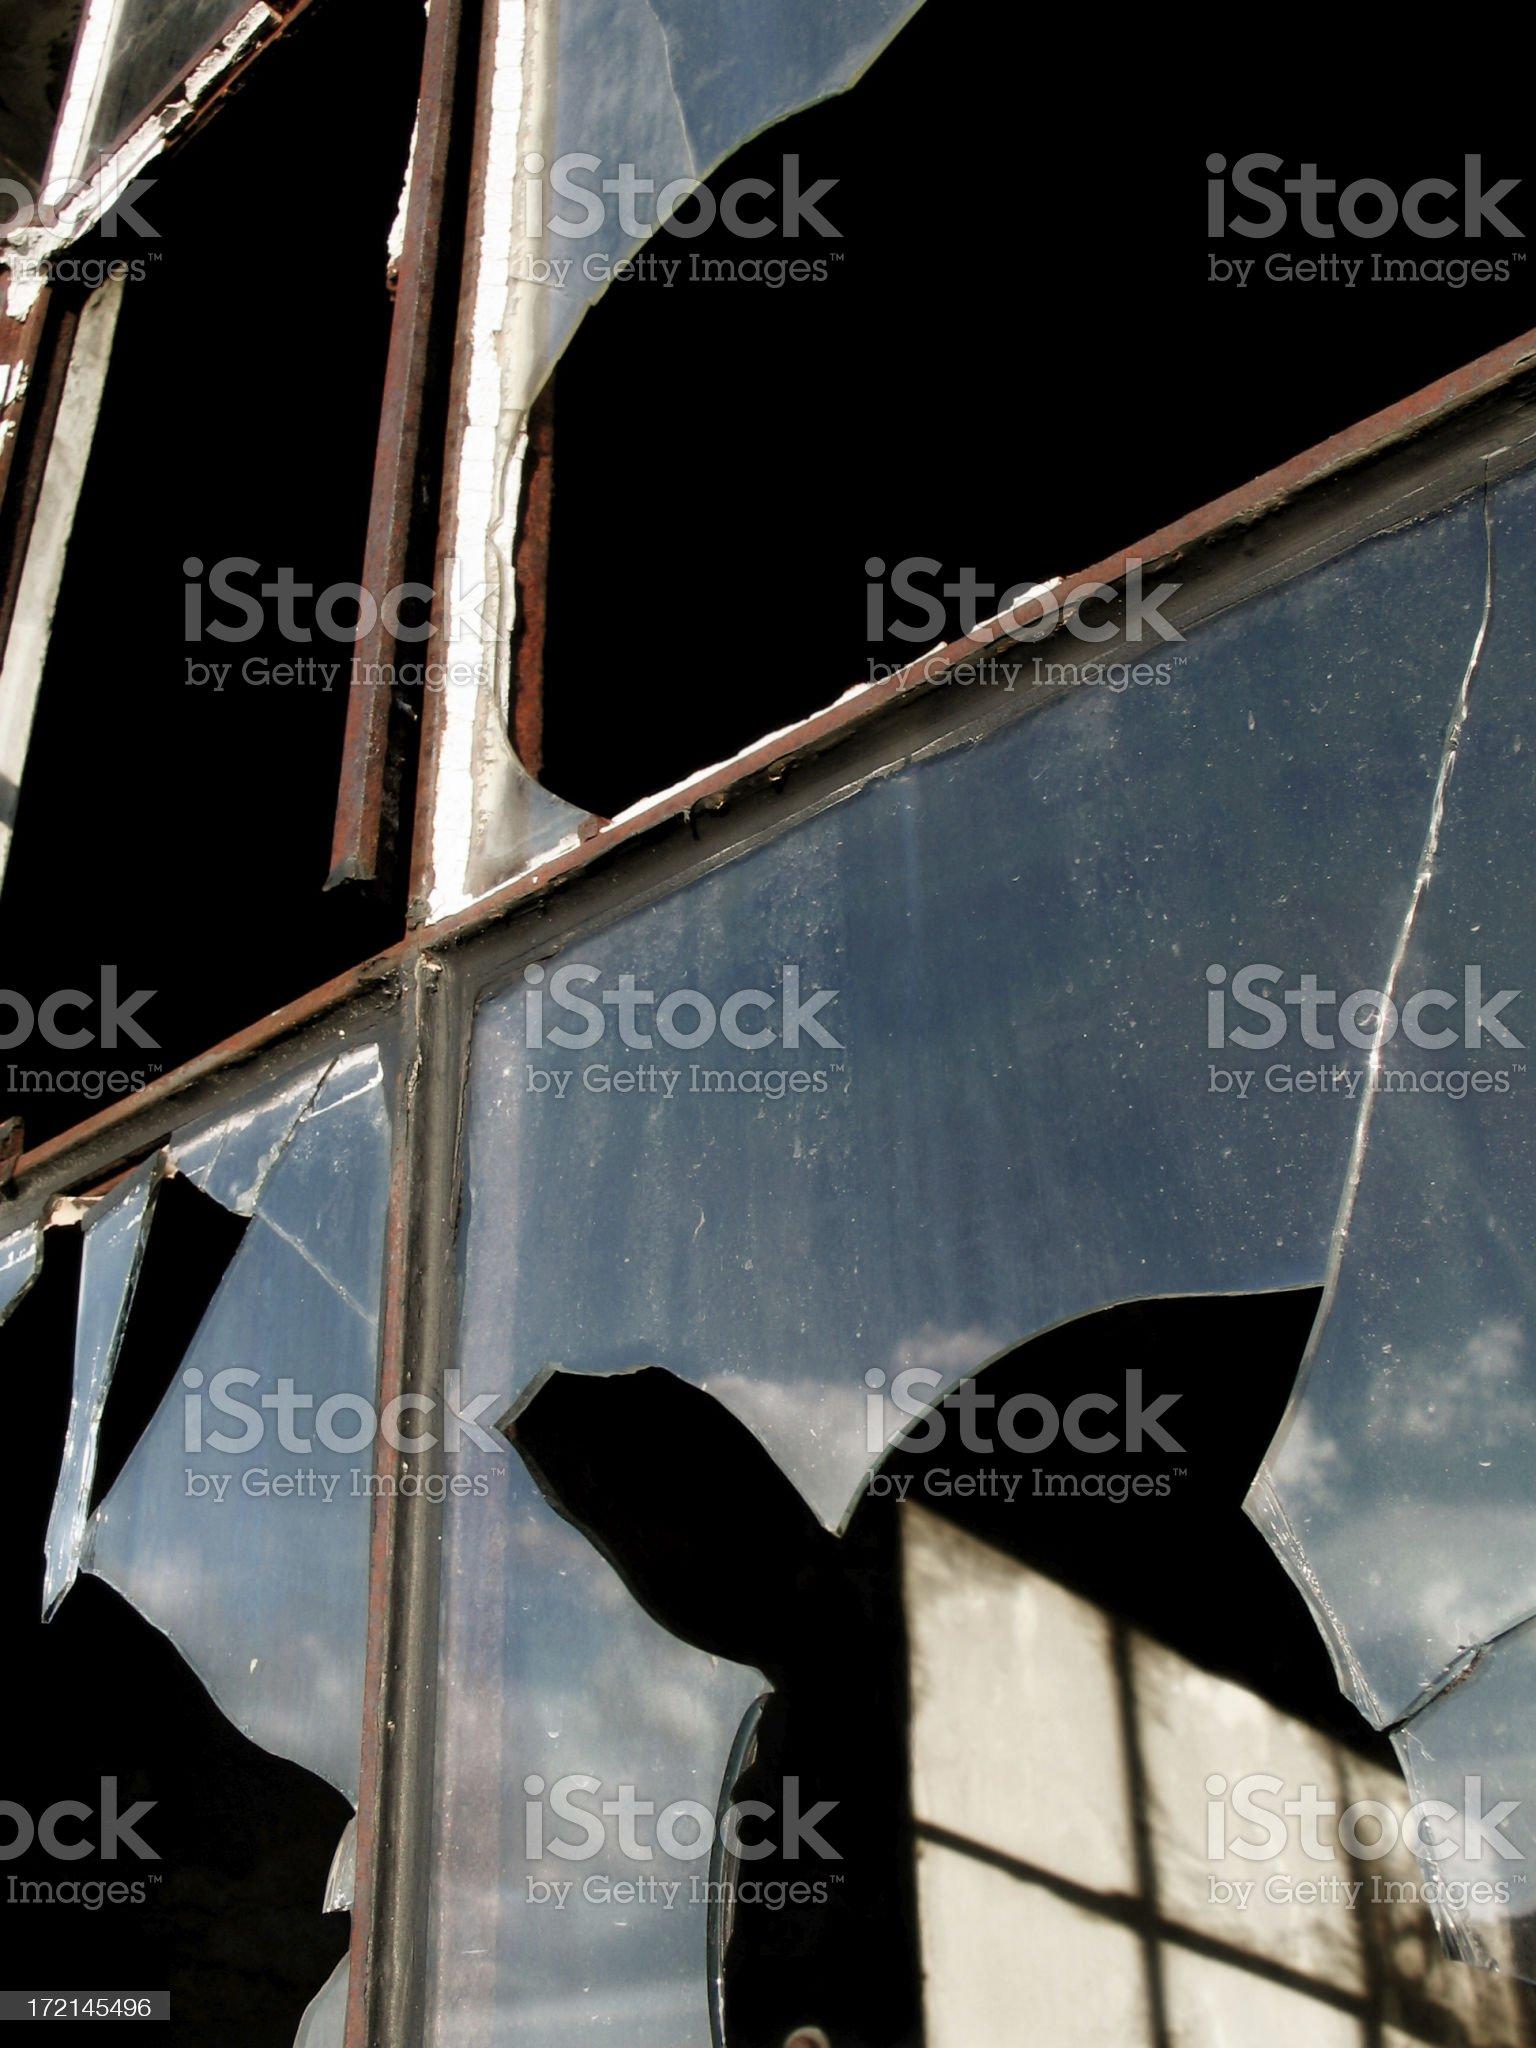 Reflection of sky in broken window royalty-free stock photo